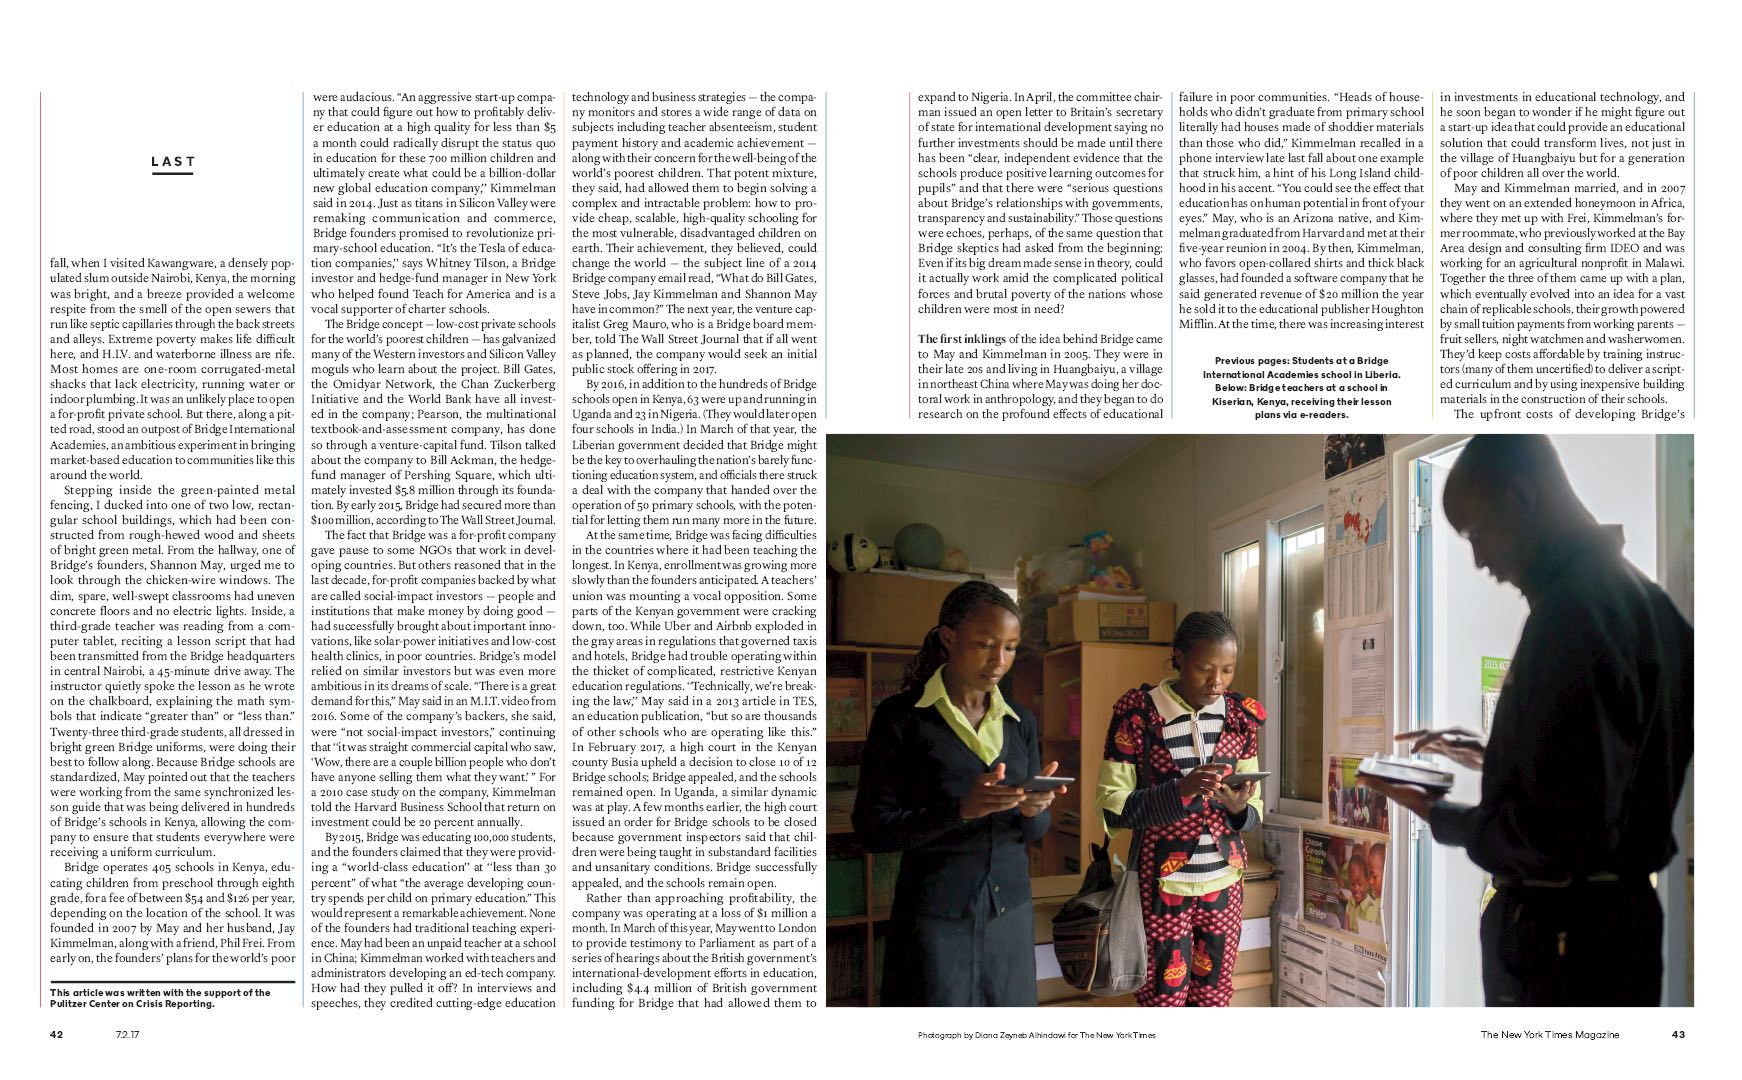 Diana Zeyneb Alhindawi_2017_07_02_New York Times Magazine_page 42 43_bridge education africa s.jpg